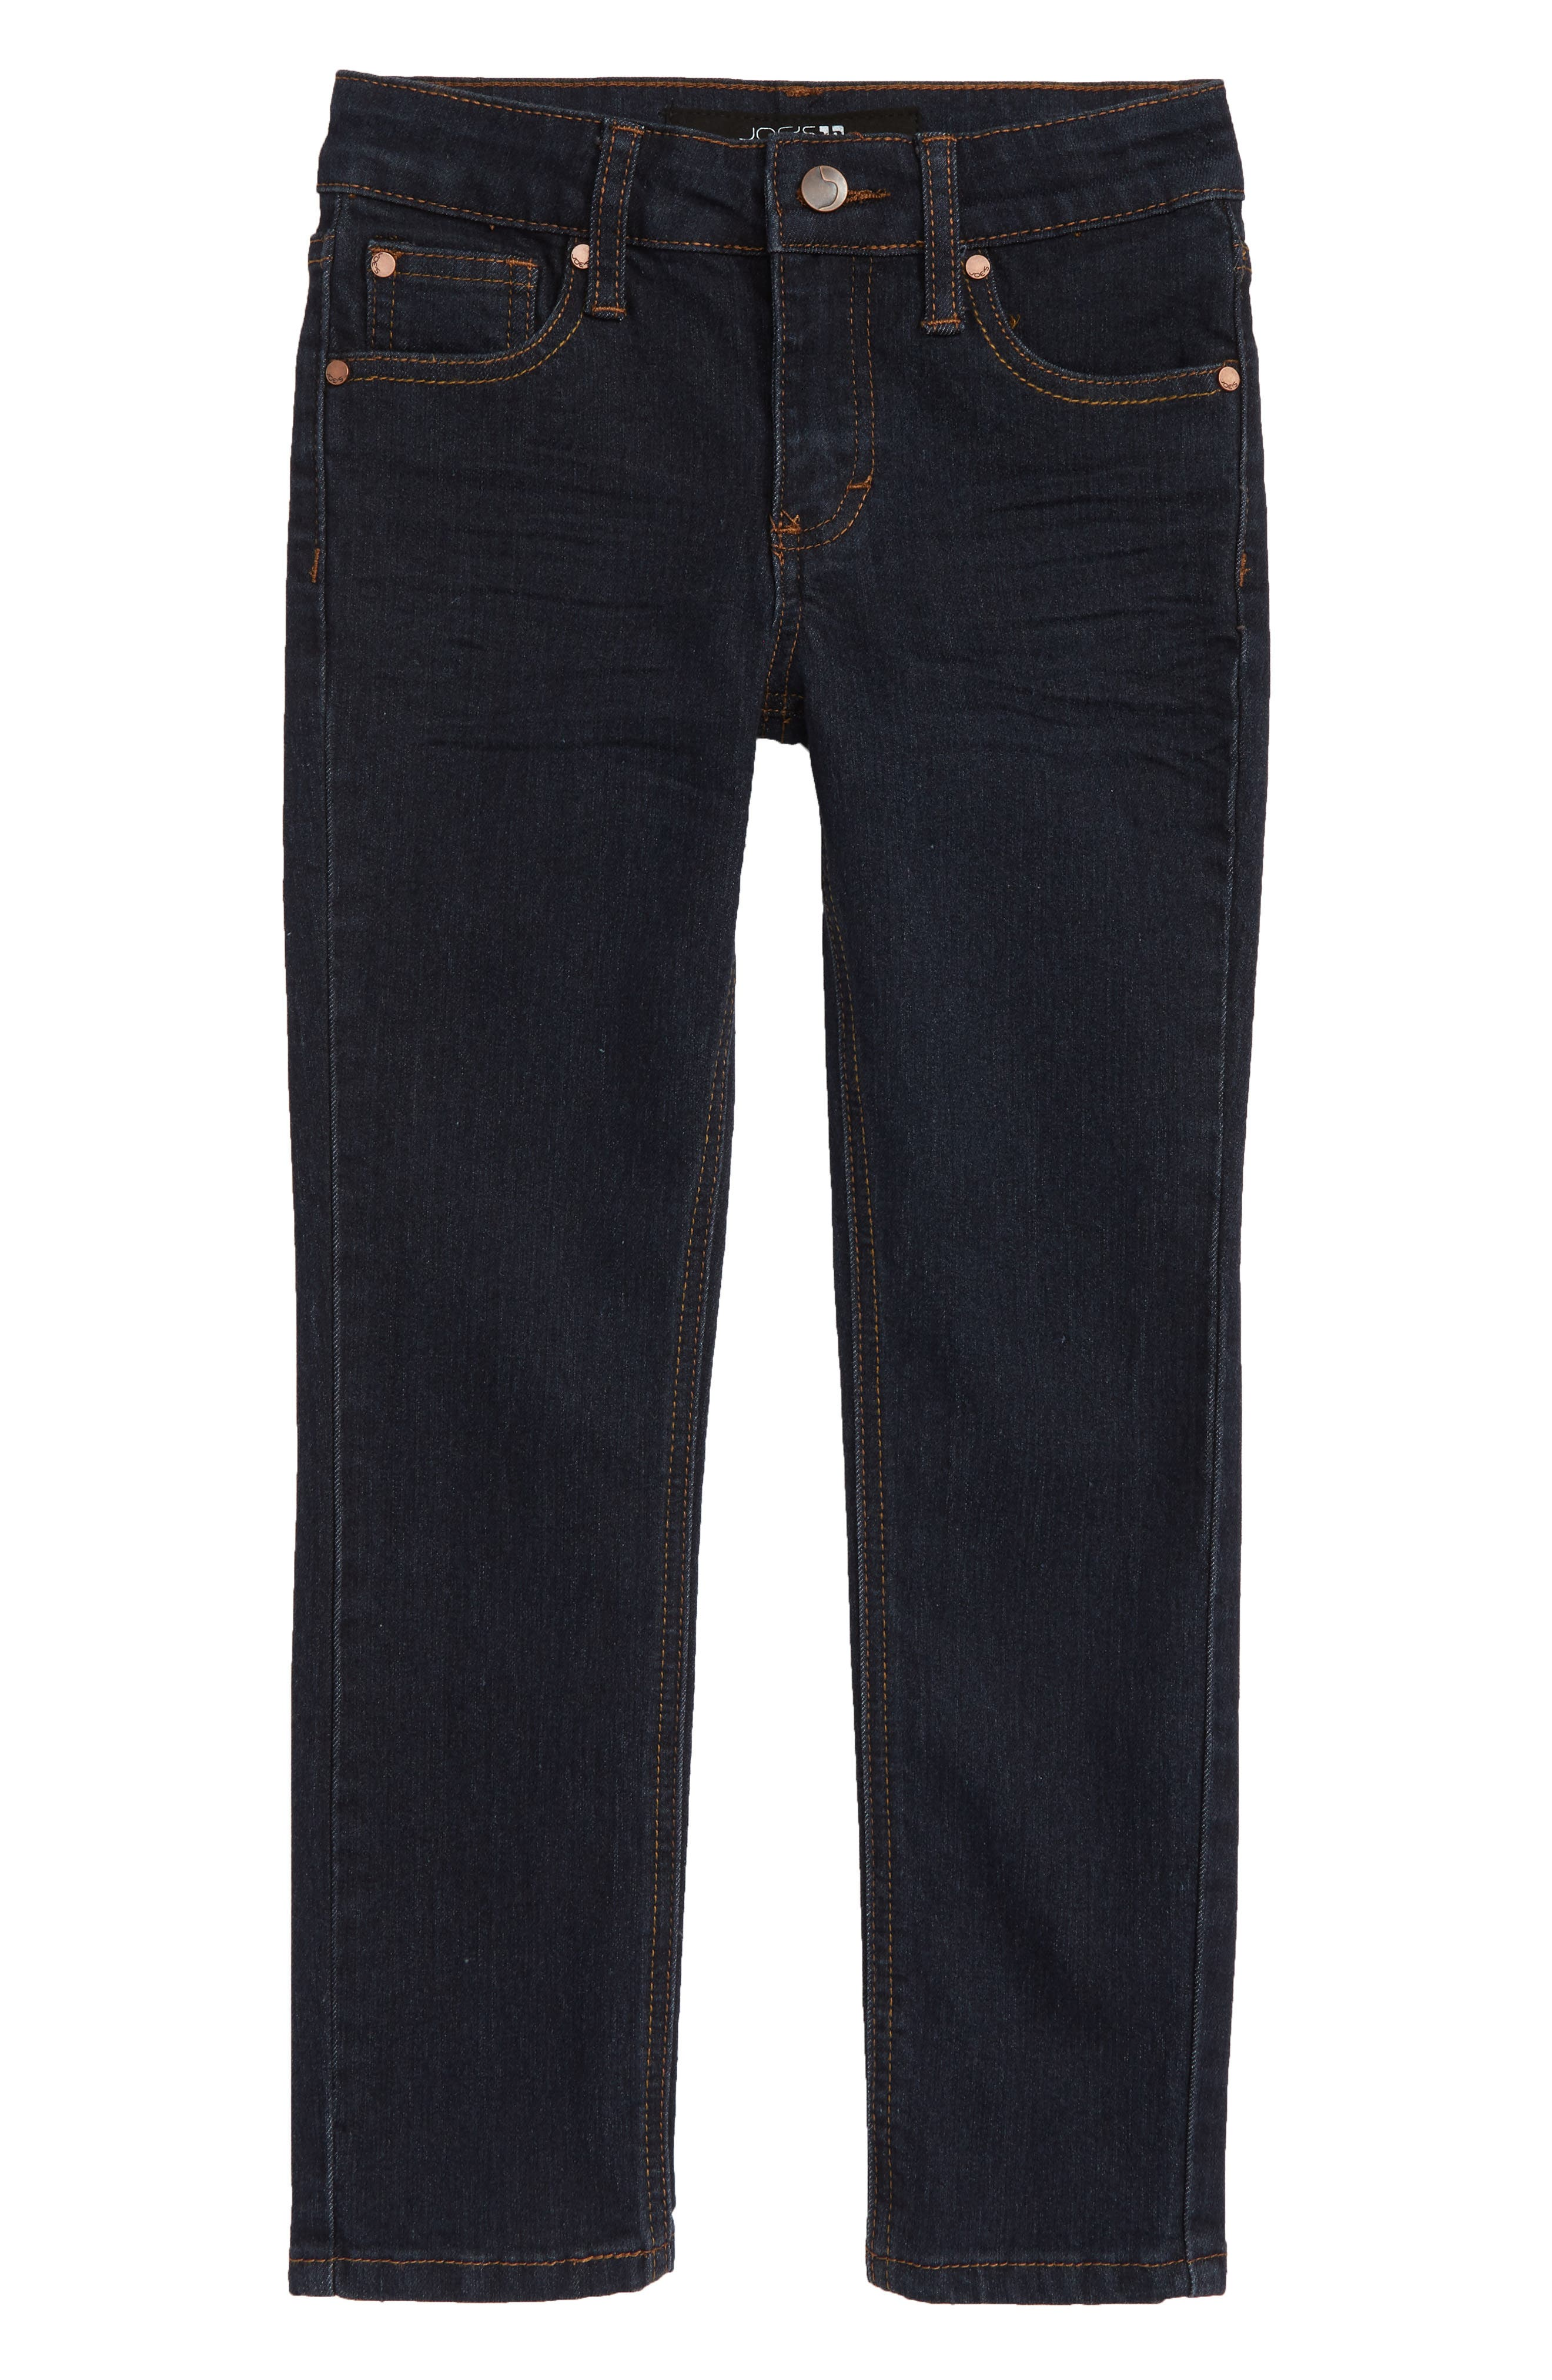 JOE'S Brixton Stretch Jeans, Main, color, RINSE